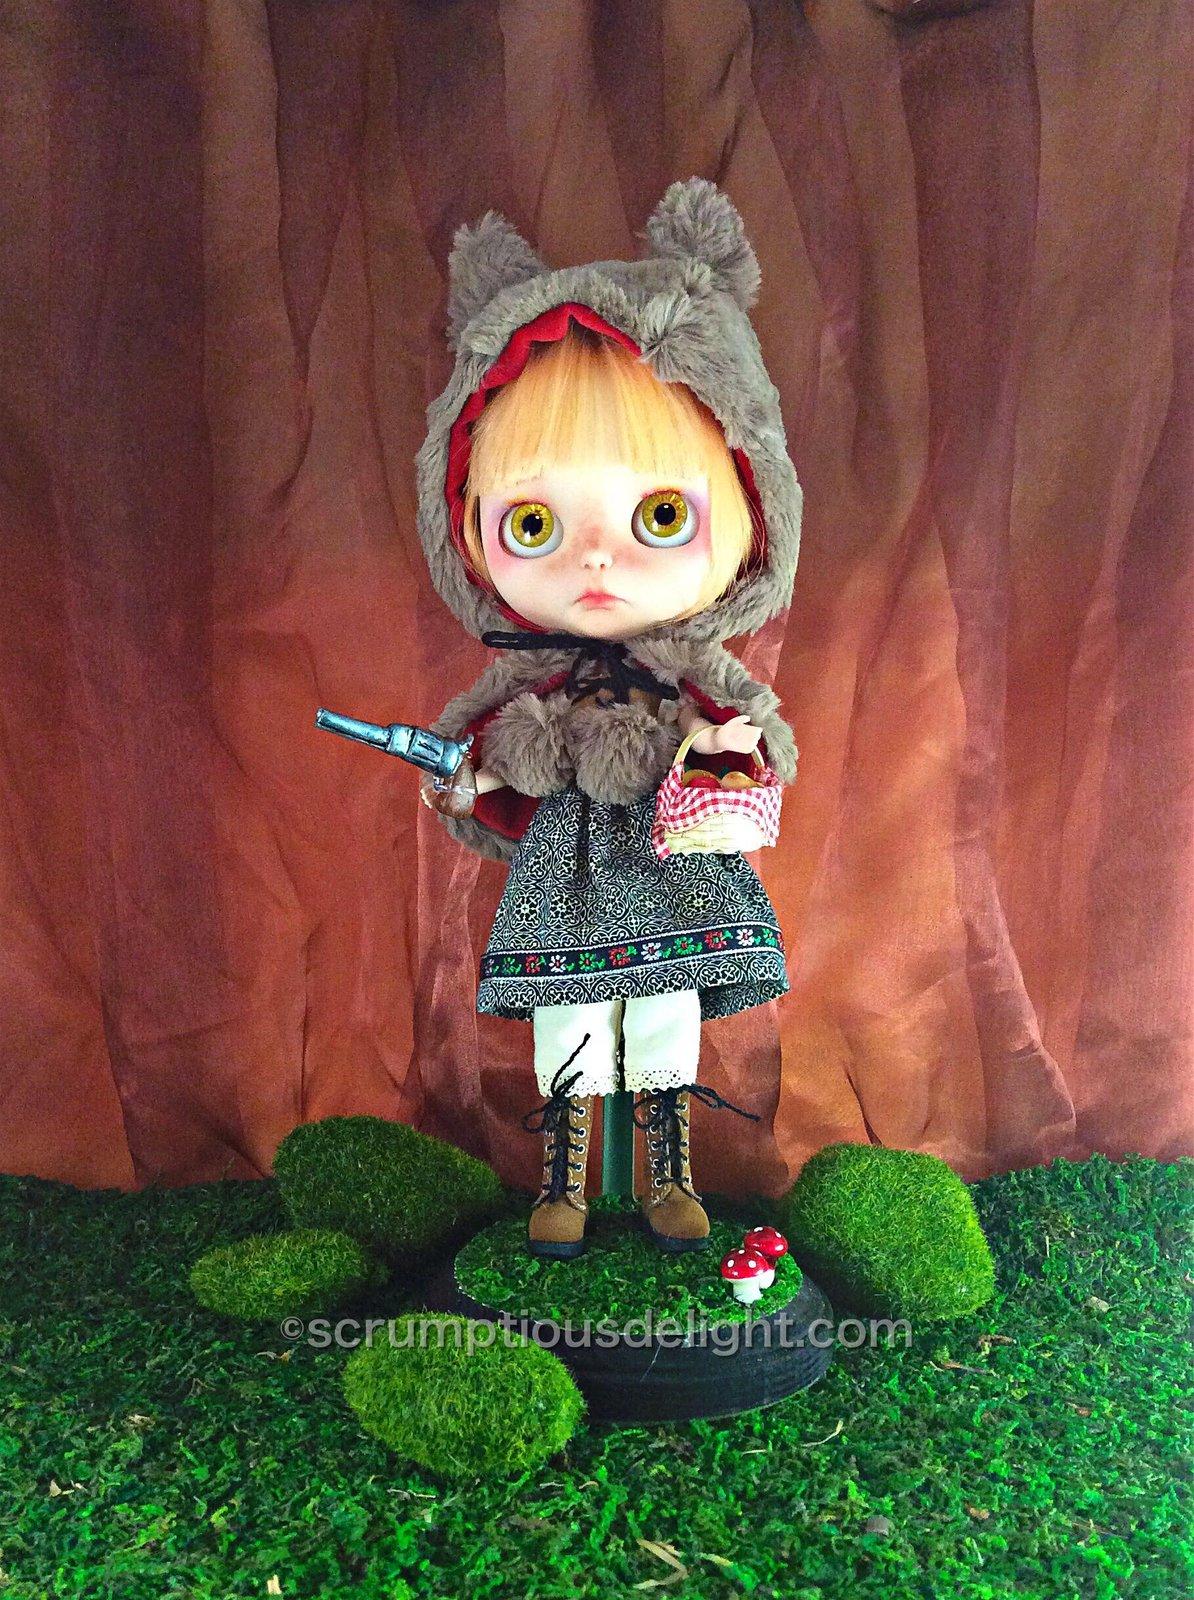 OOAK Takara Custom Blythe Doll by Scrumptious Delight: Date w/ Blythe Auction